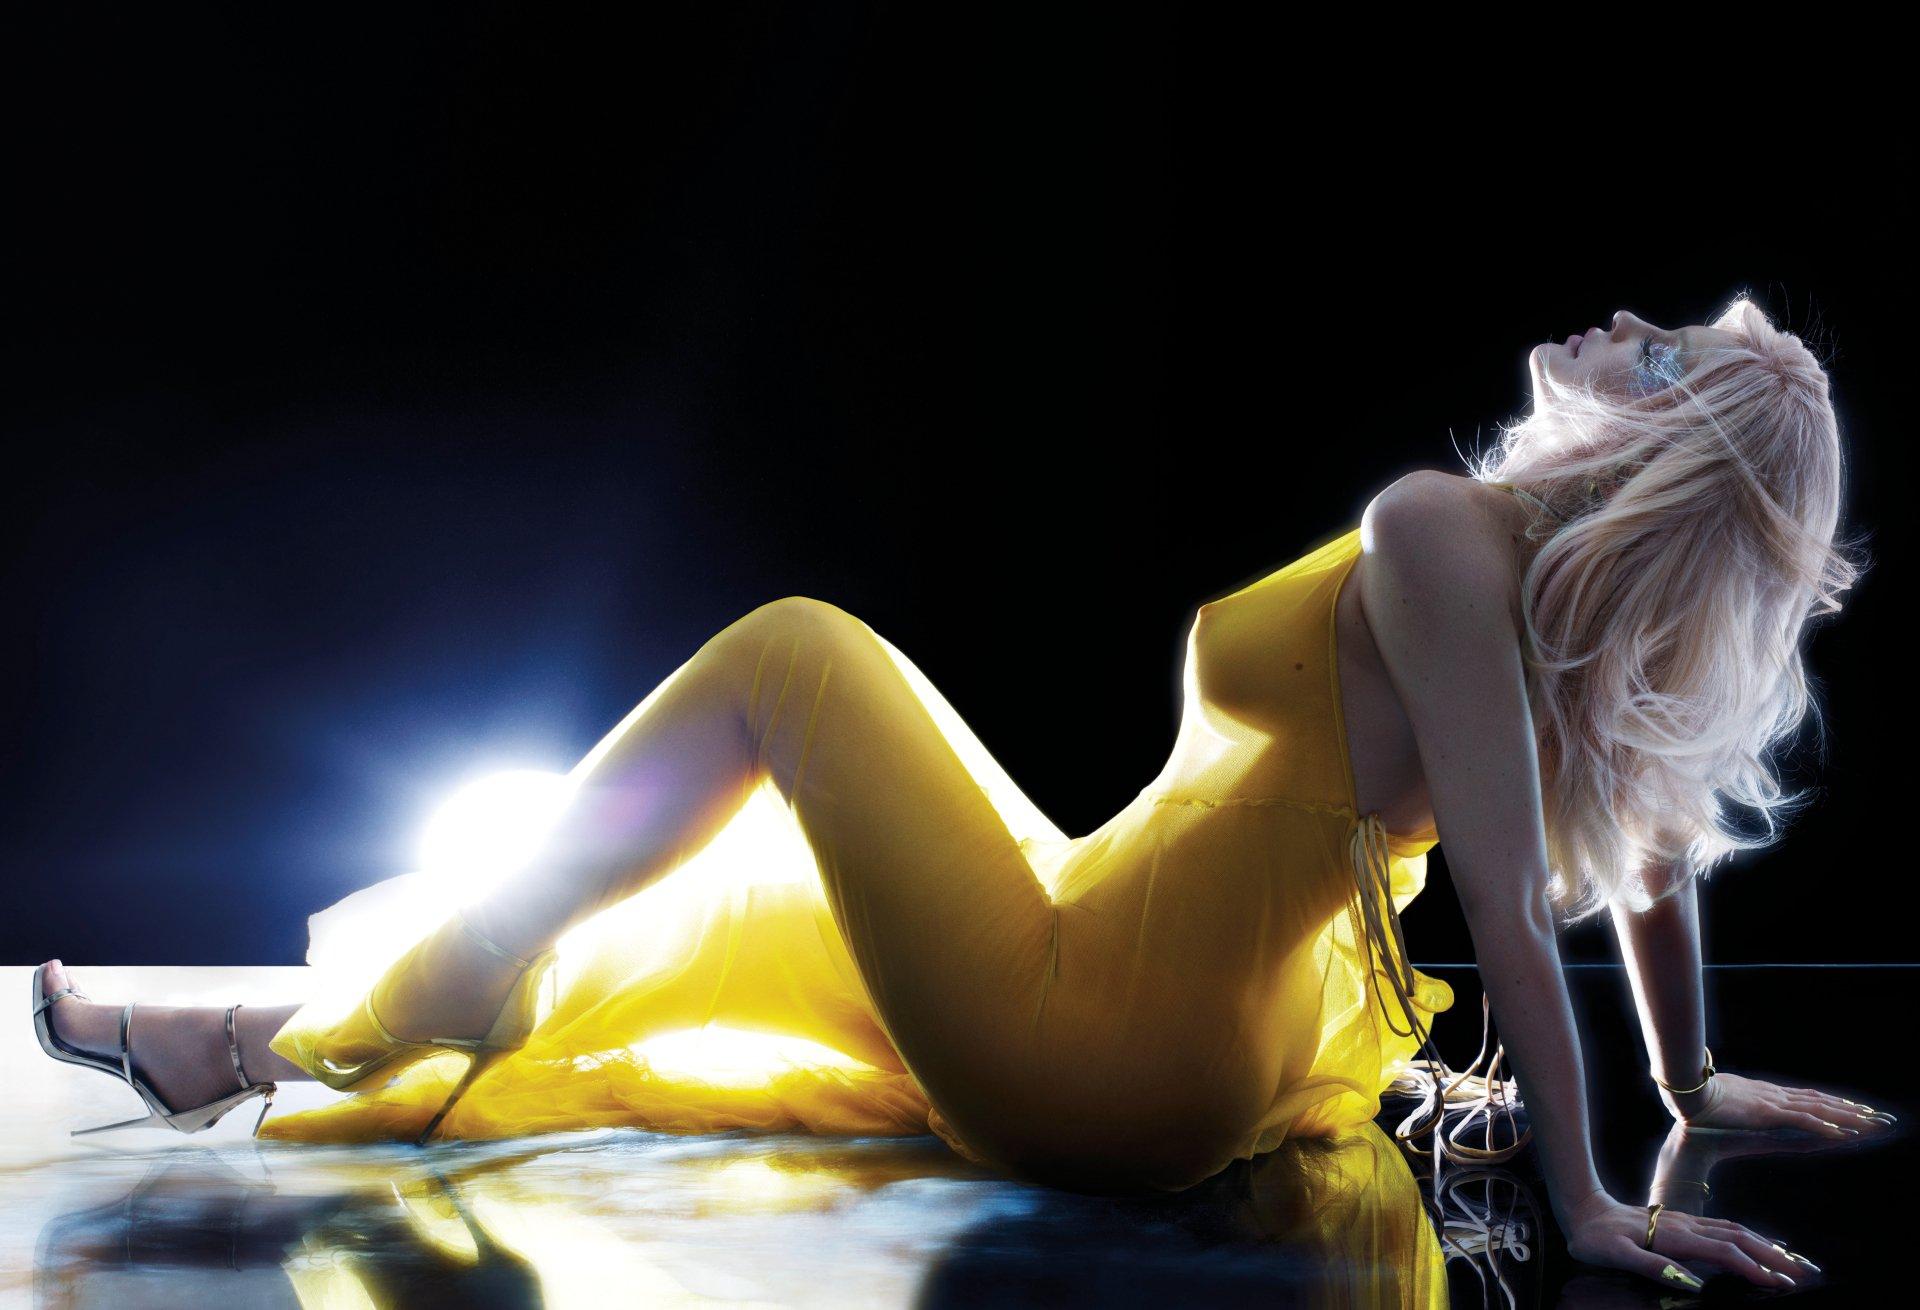 Kylie Jenner Naked Boobs